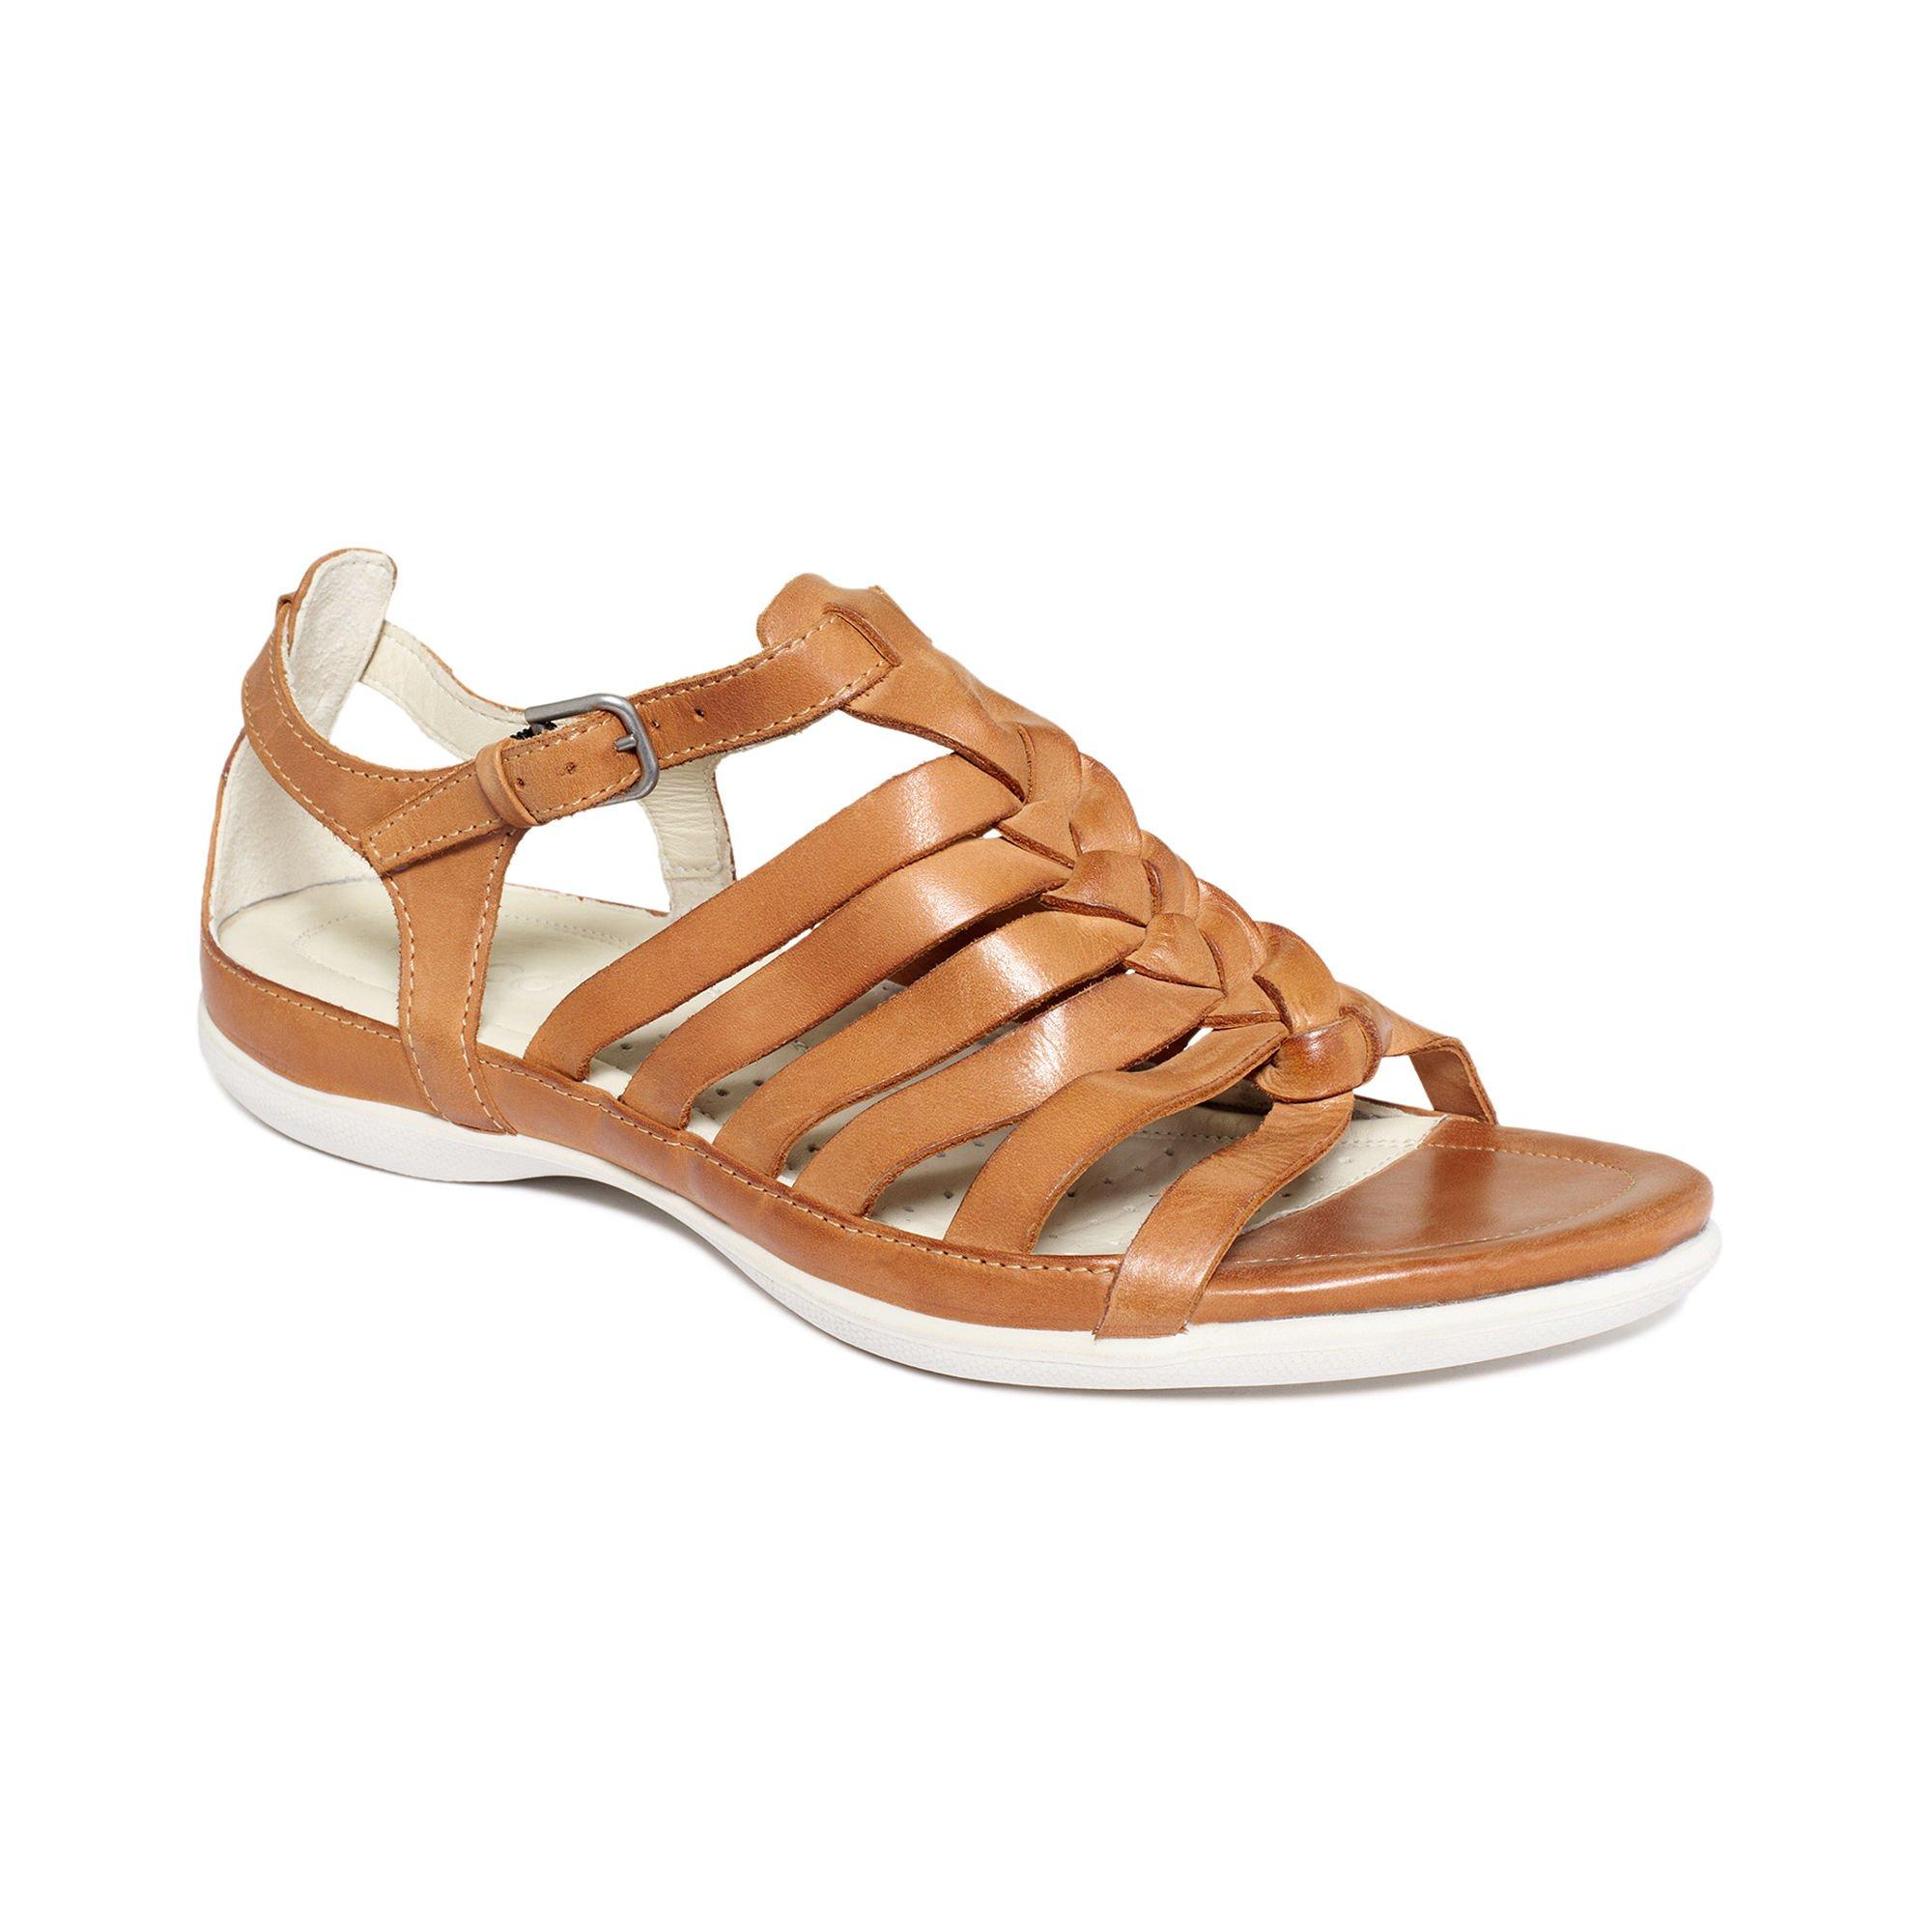 Fisherman Sandals Women S Shoes